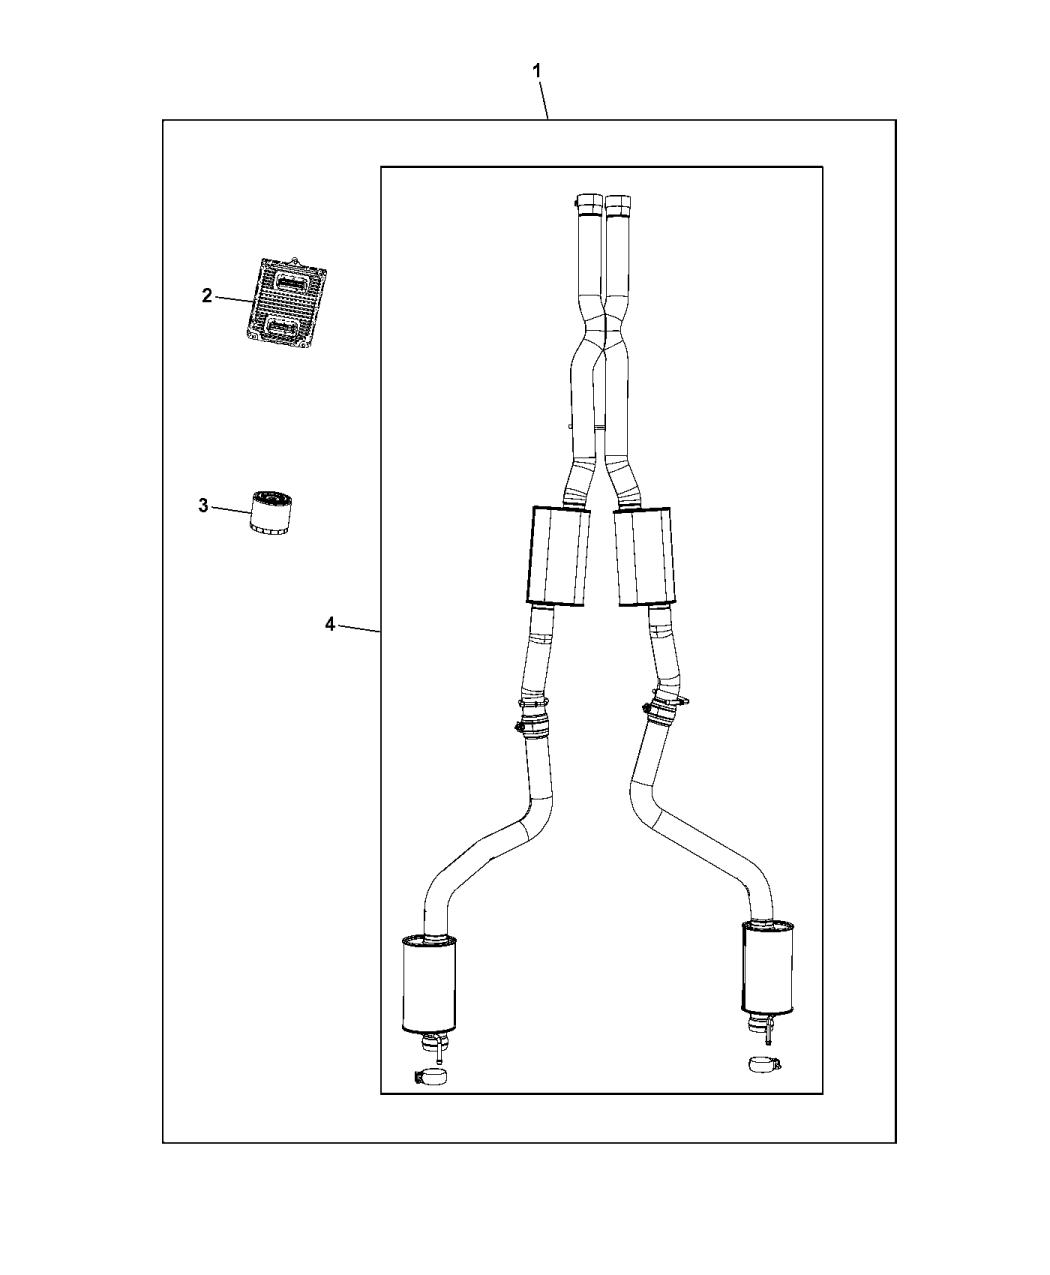 2017 Dodge Challenger Performance Kit Scat Pack Srt 4 Wiring Harness Diagram